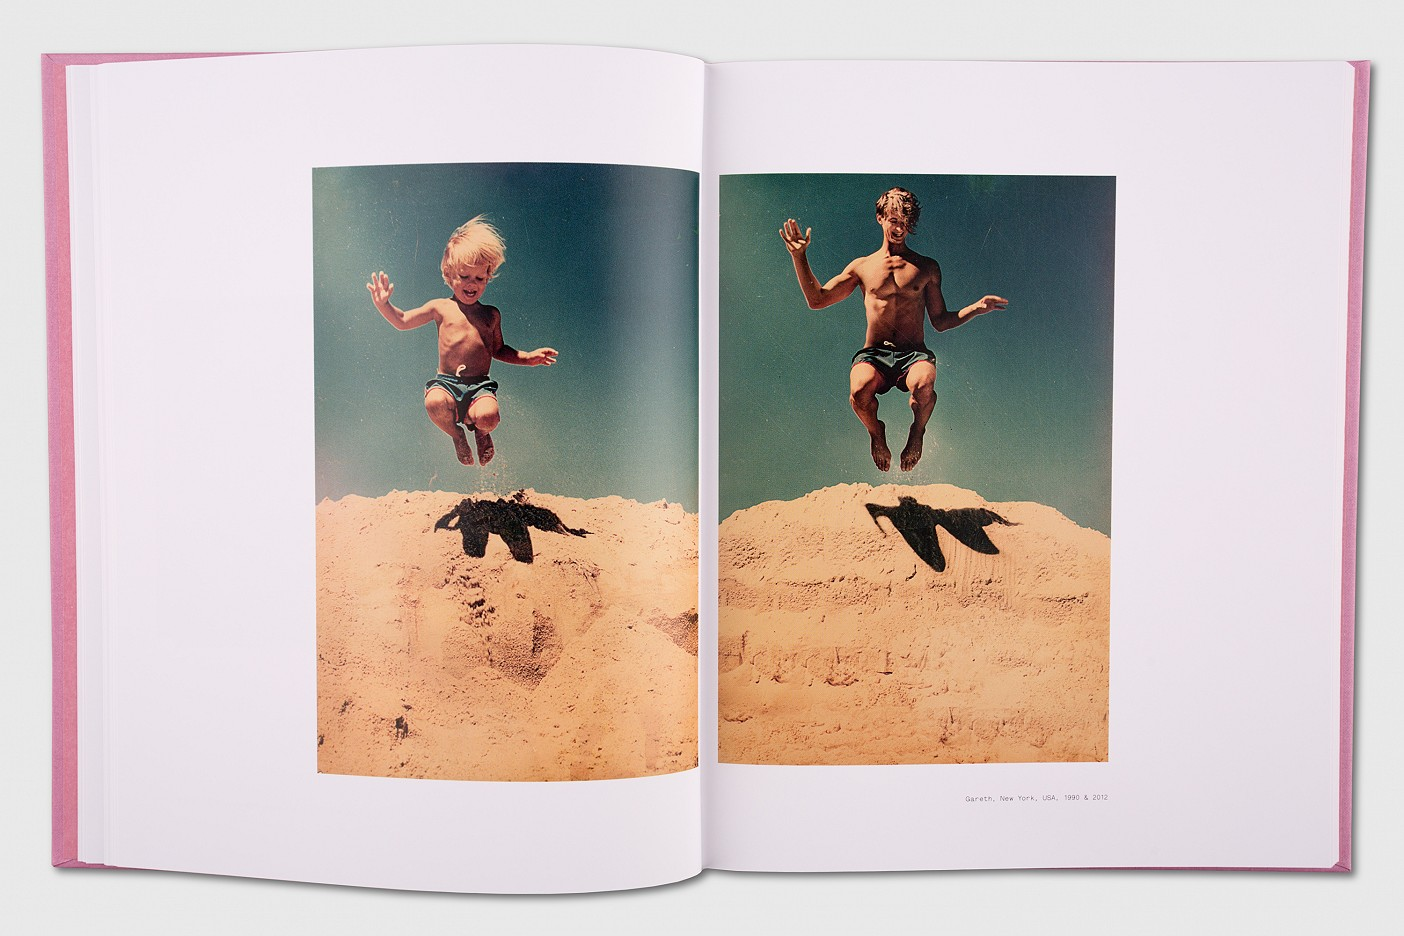 Irina Werning's Back to the Future